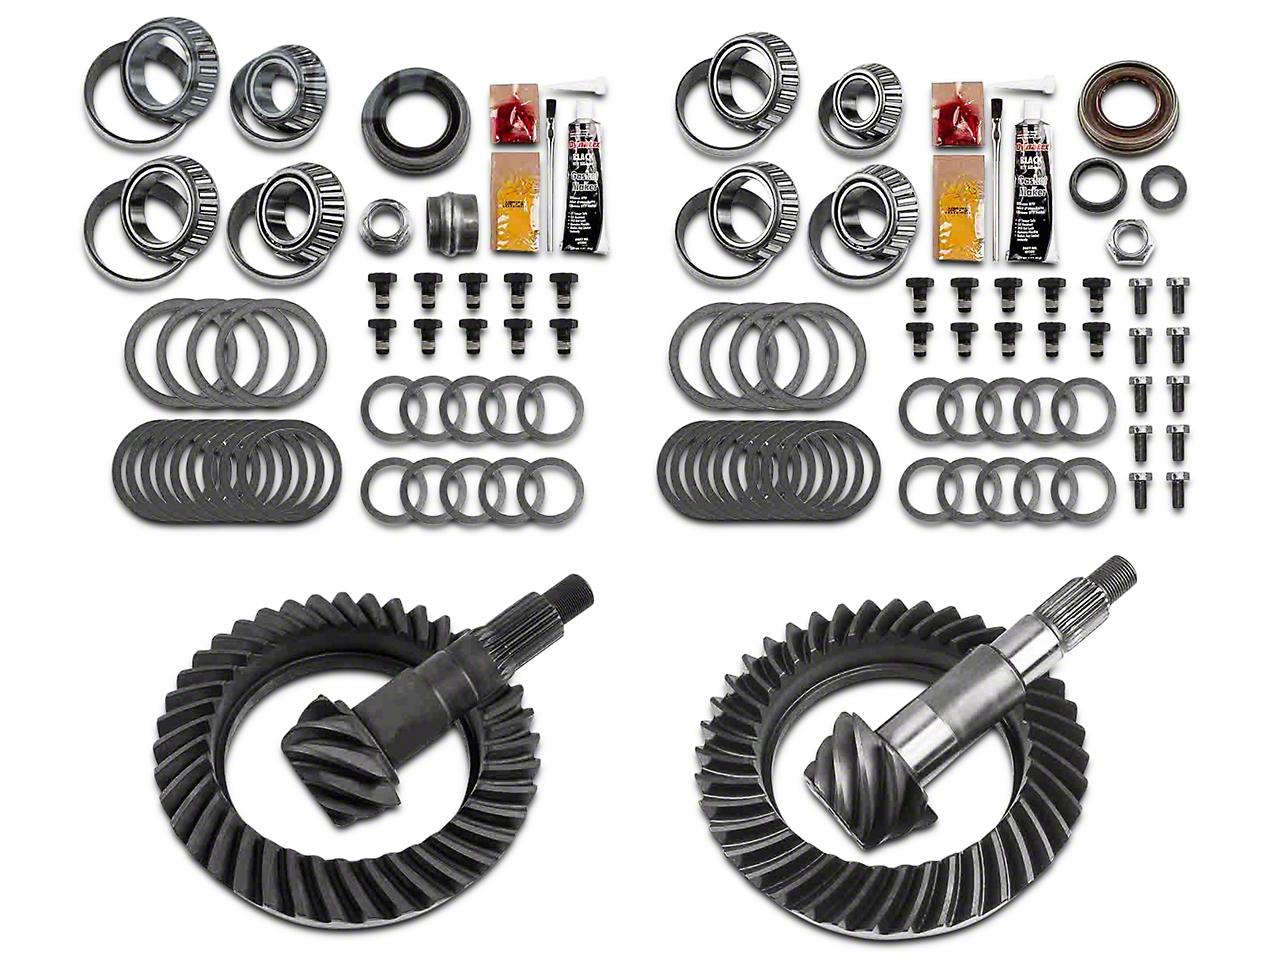 Motive Dana 44F/44R Complete Ring Gear and Pinion Kit - 4.88 Gears (07-18 Jeep Wrangler JK Rubicon)